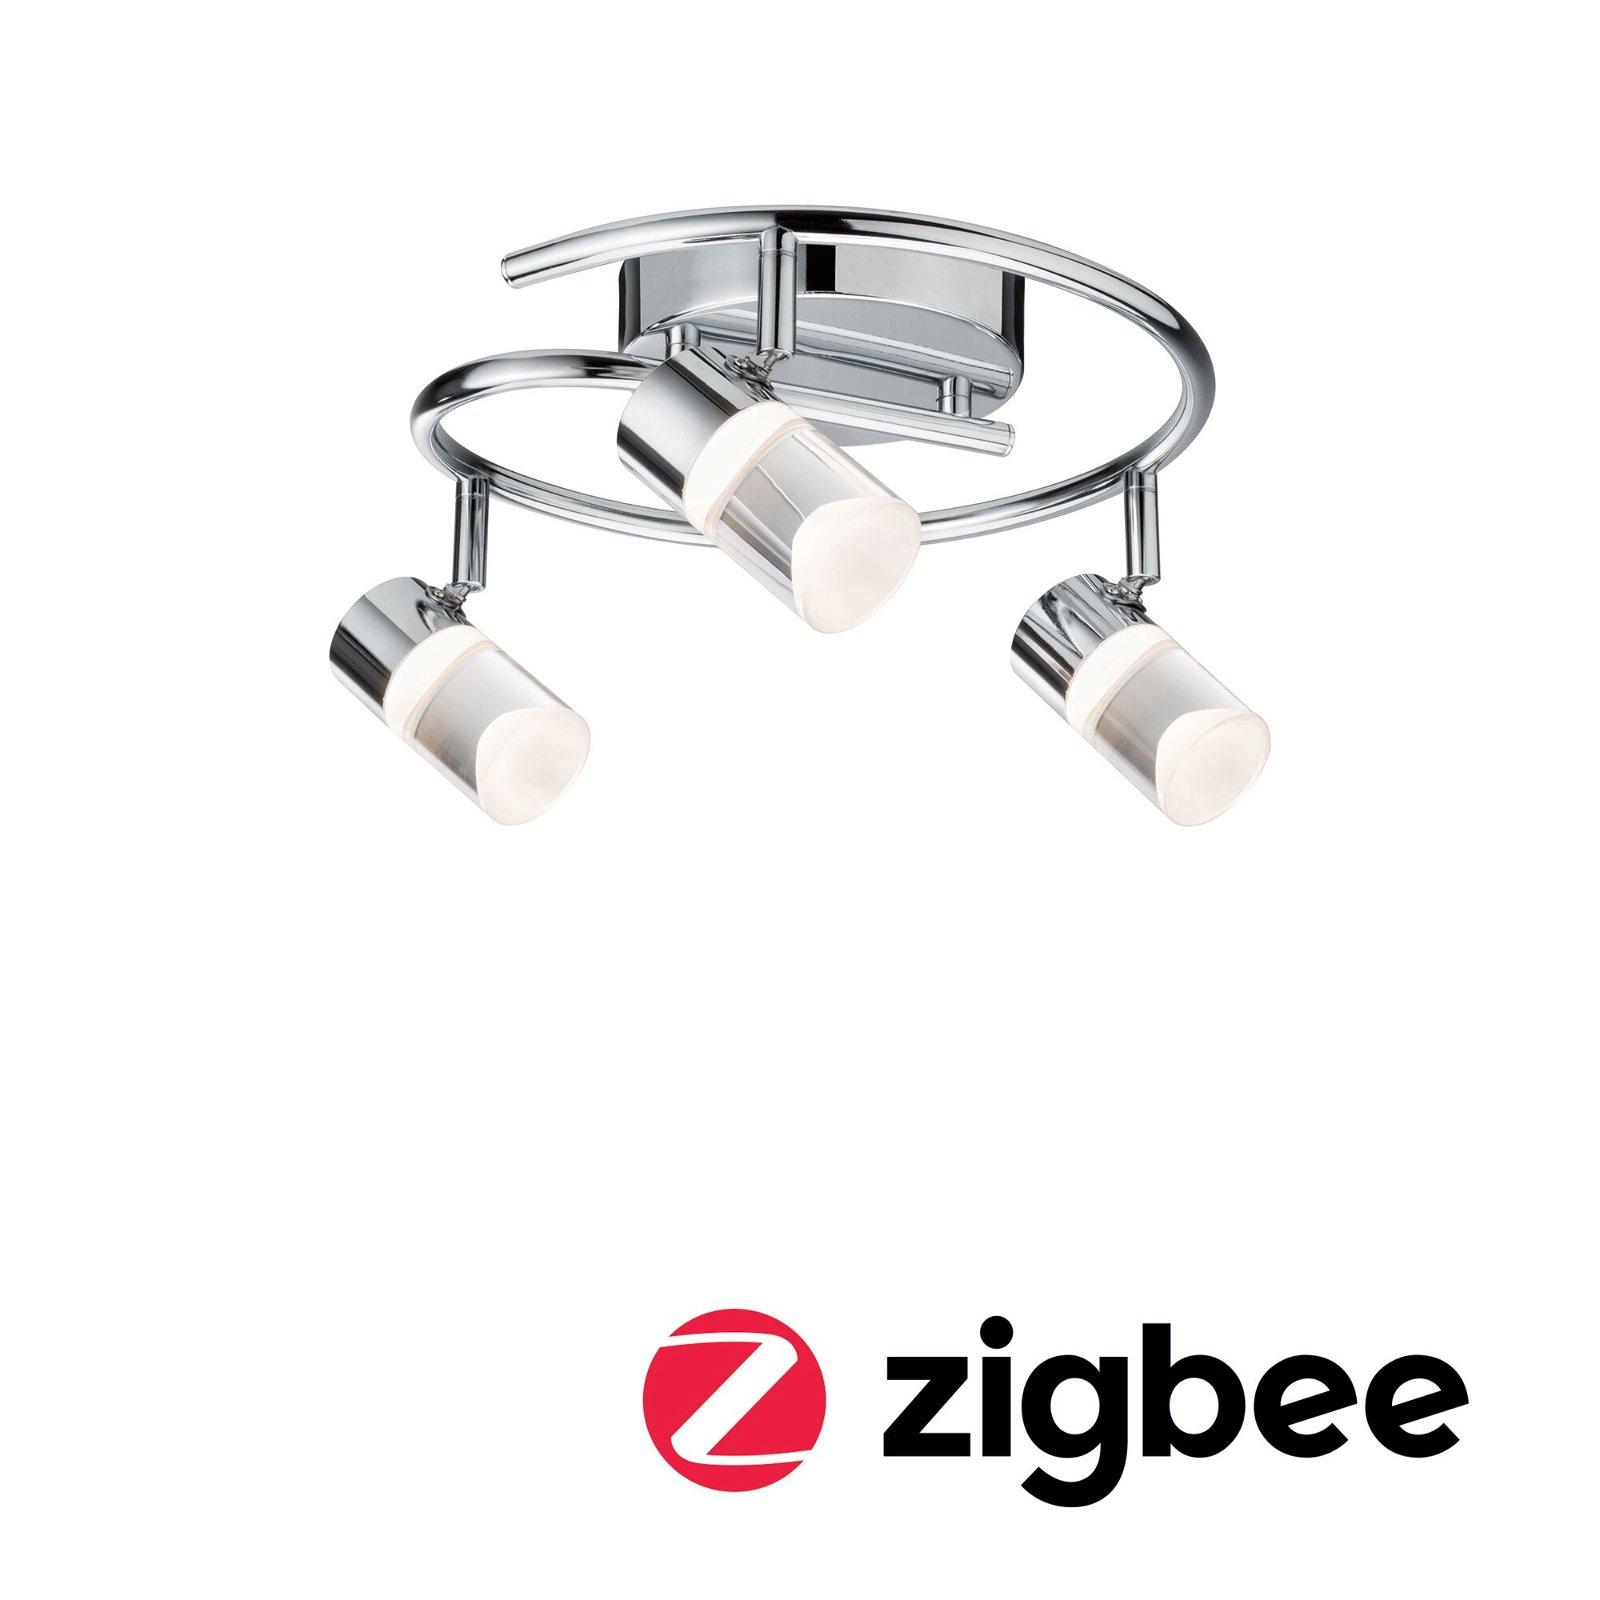 Smart Home Zigbee Spot Zala 3-flammig dimmbar Chrom